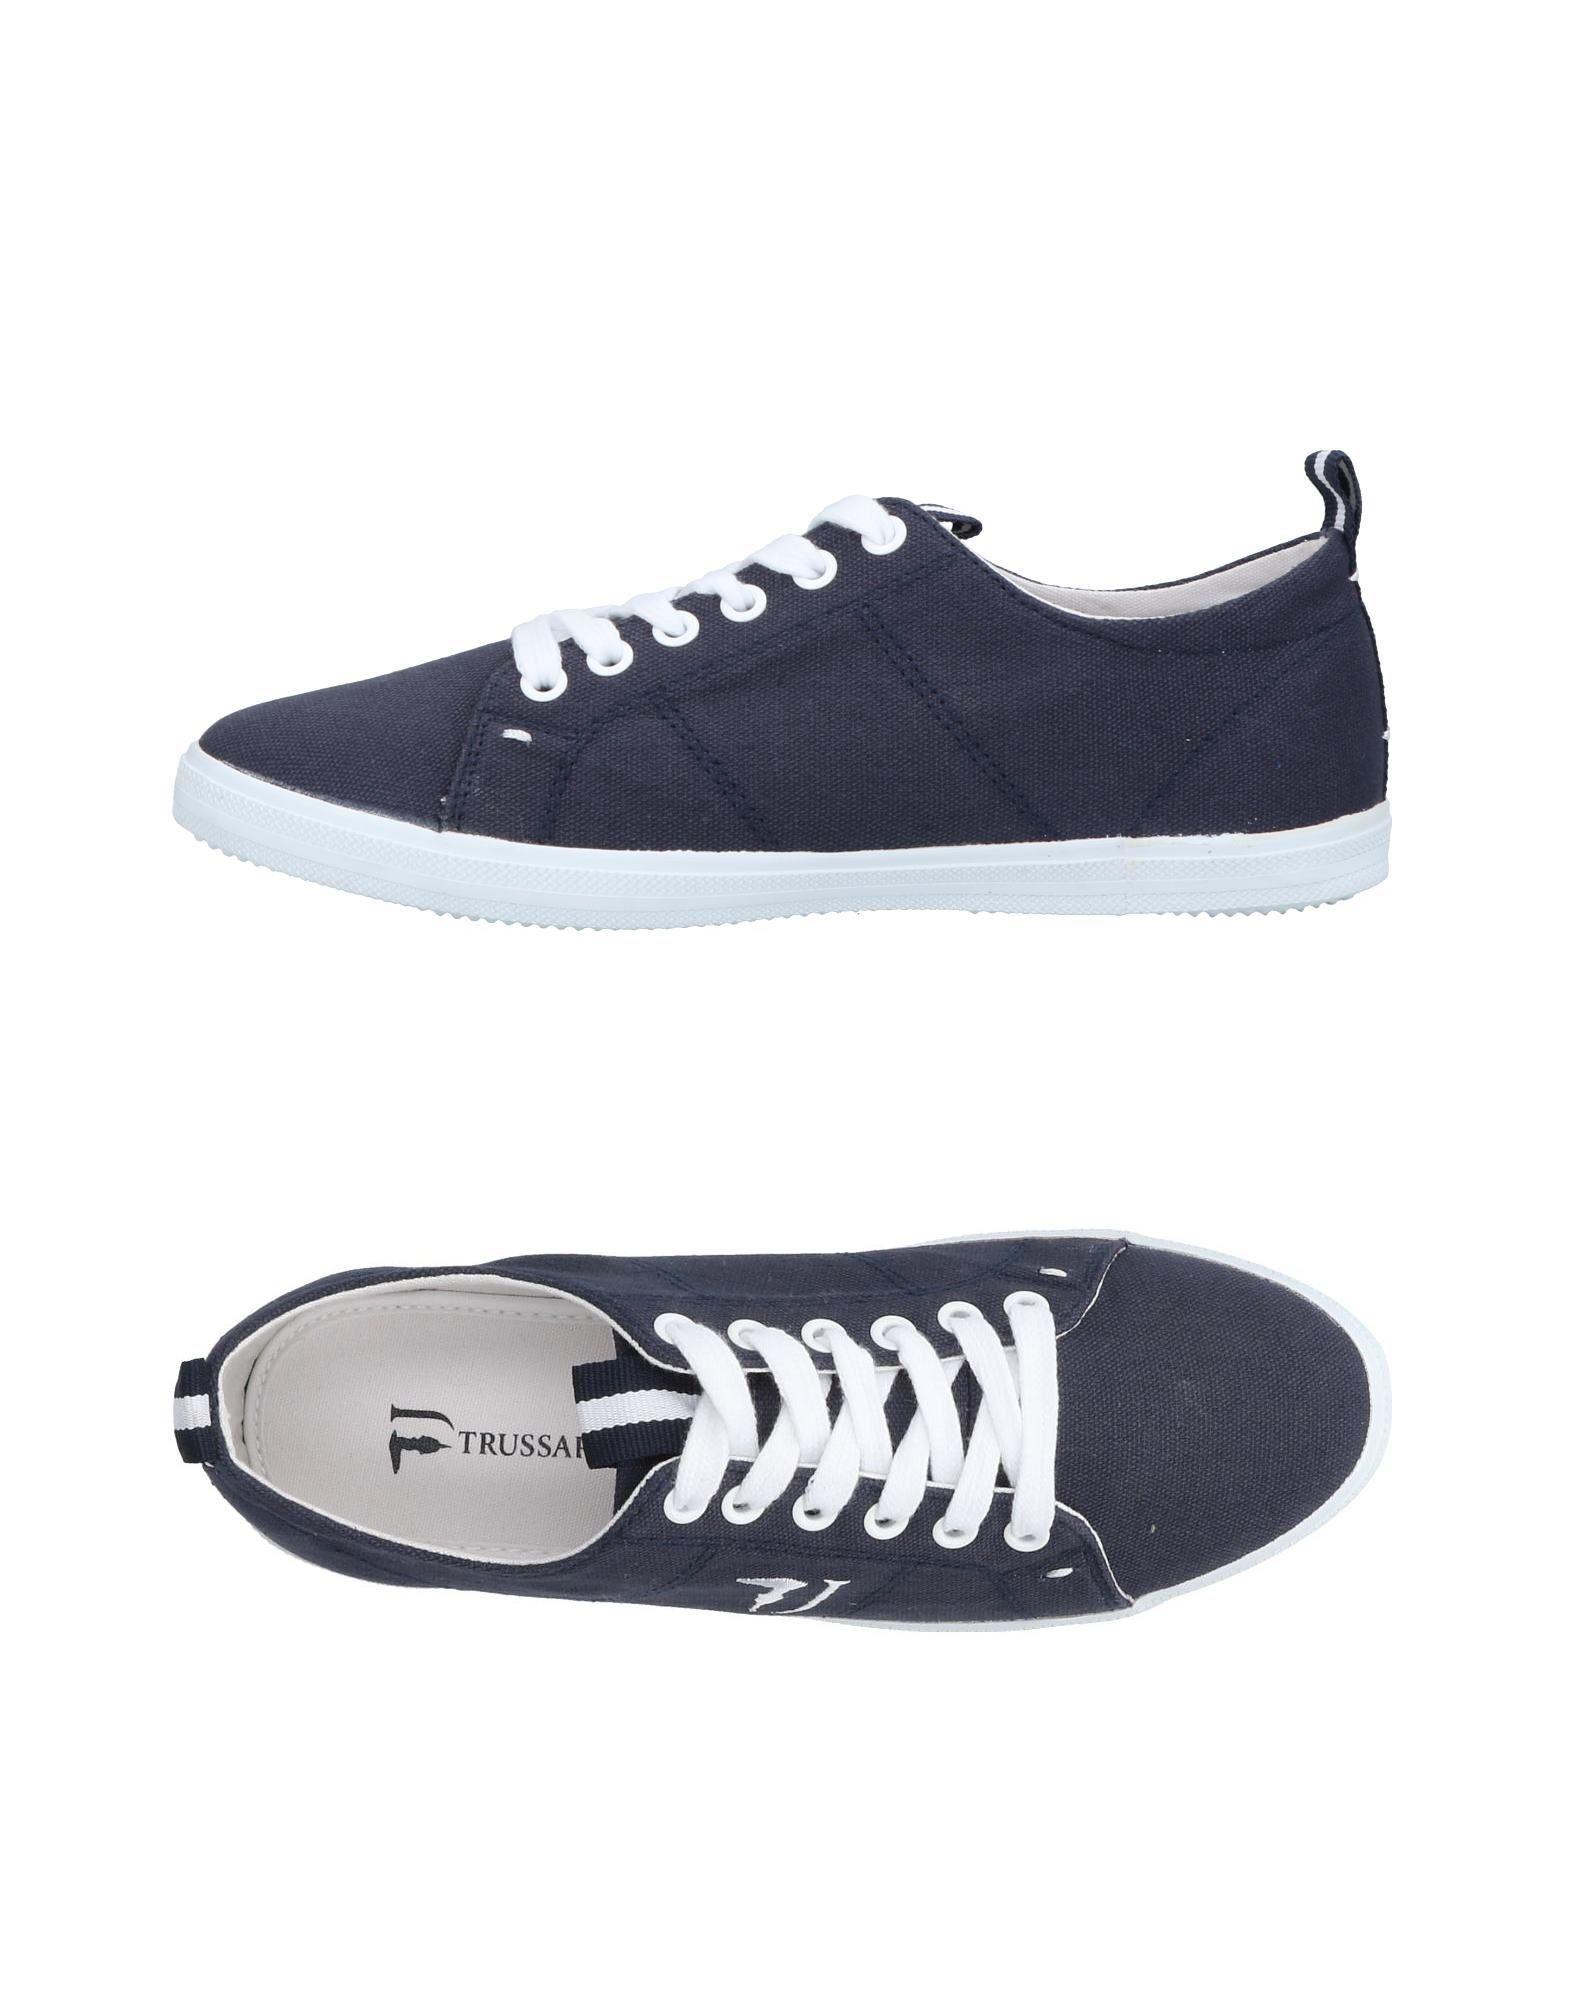 Trussardi Jeans Sneakers Damen  11467771MK Gute Qualität beliebte Schuhe